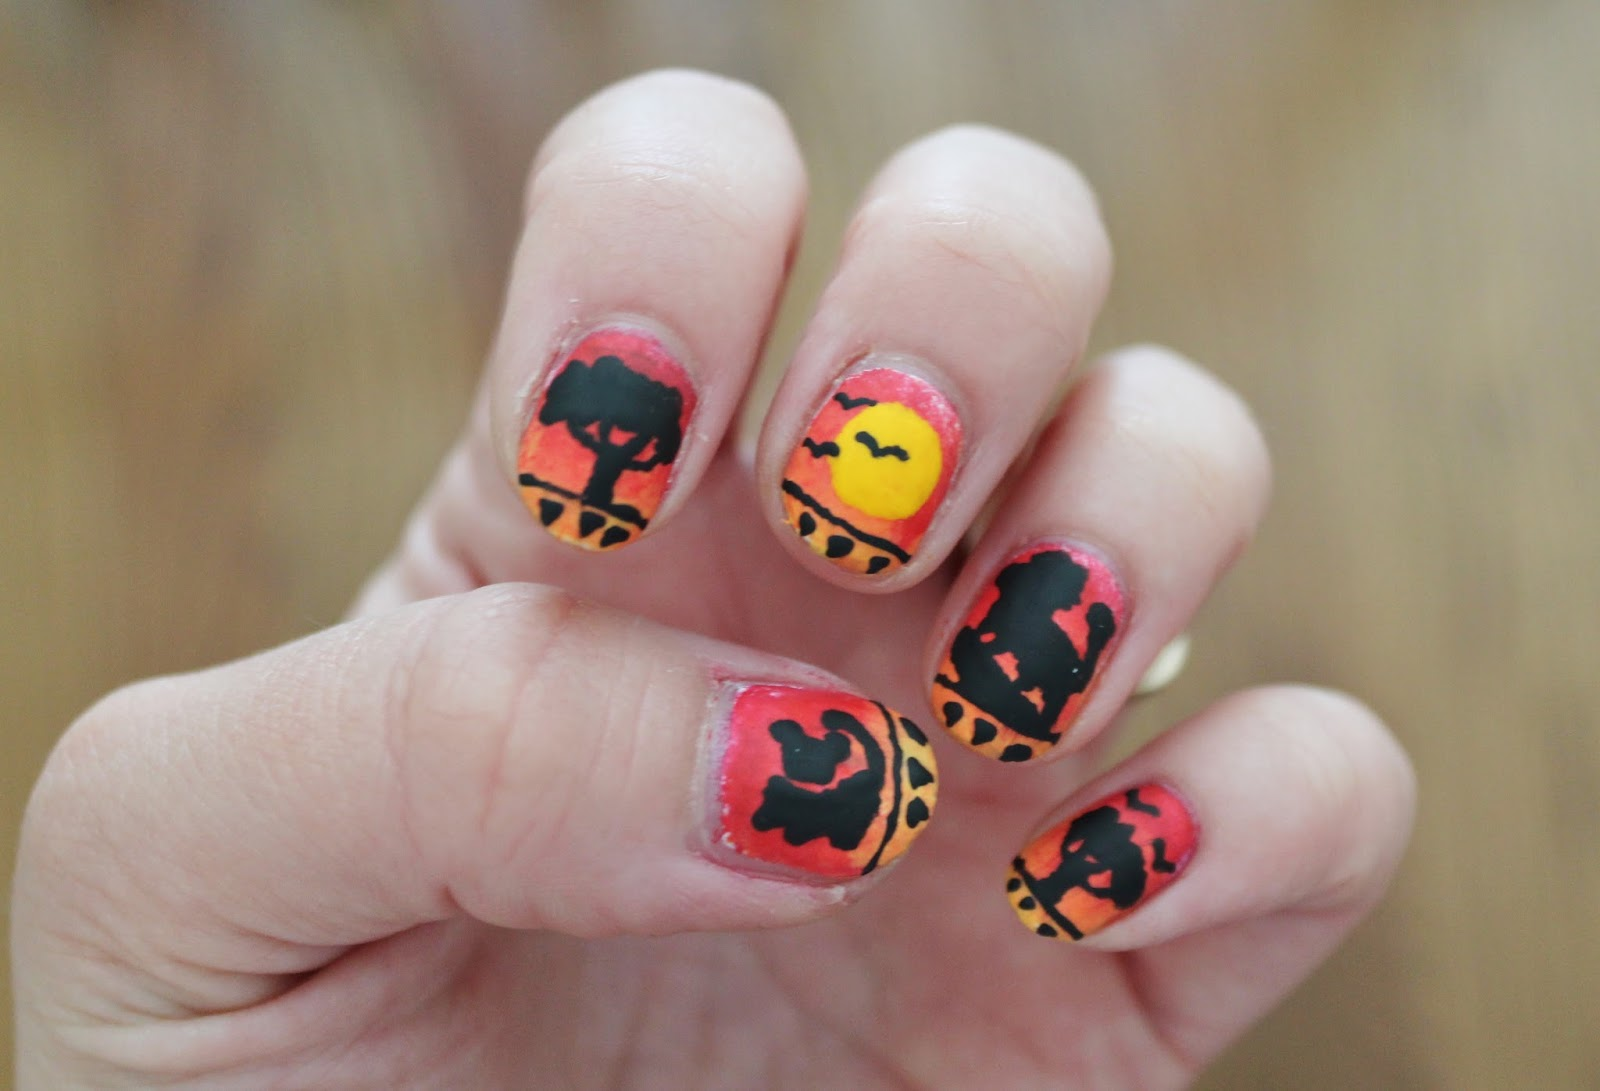 The Lion King Nail Art - Jersey Girl, Texan Heart